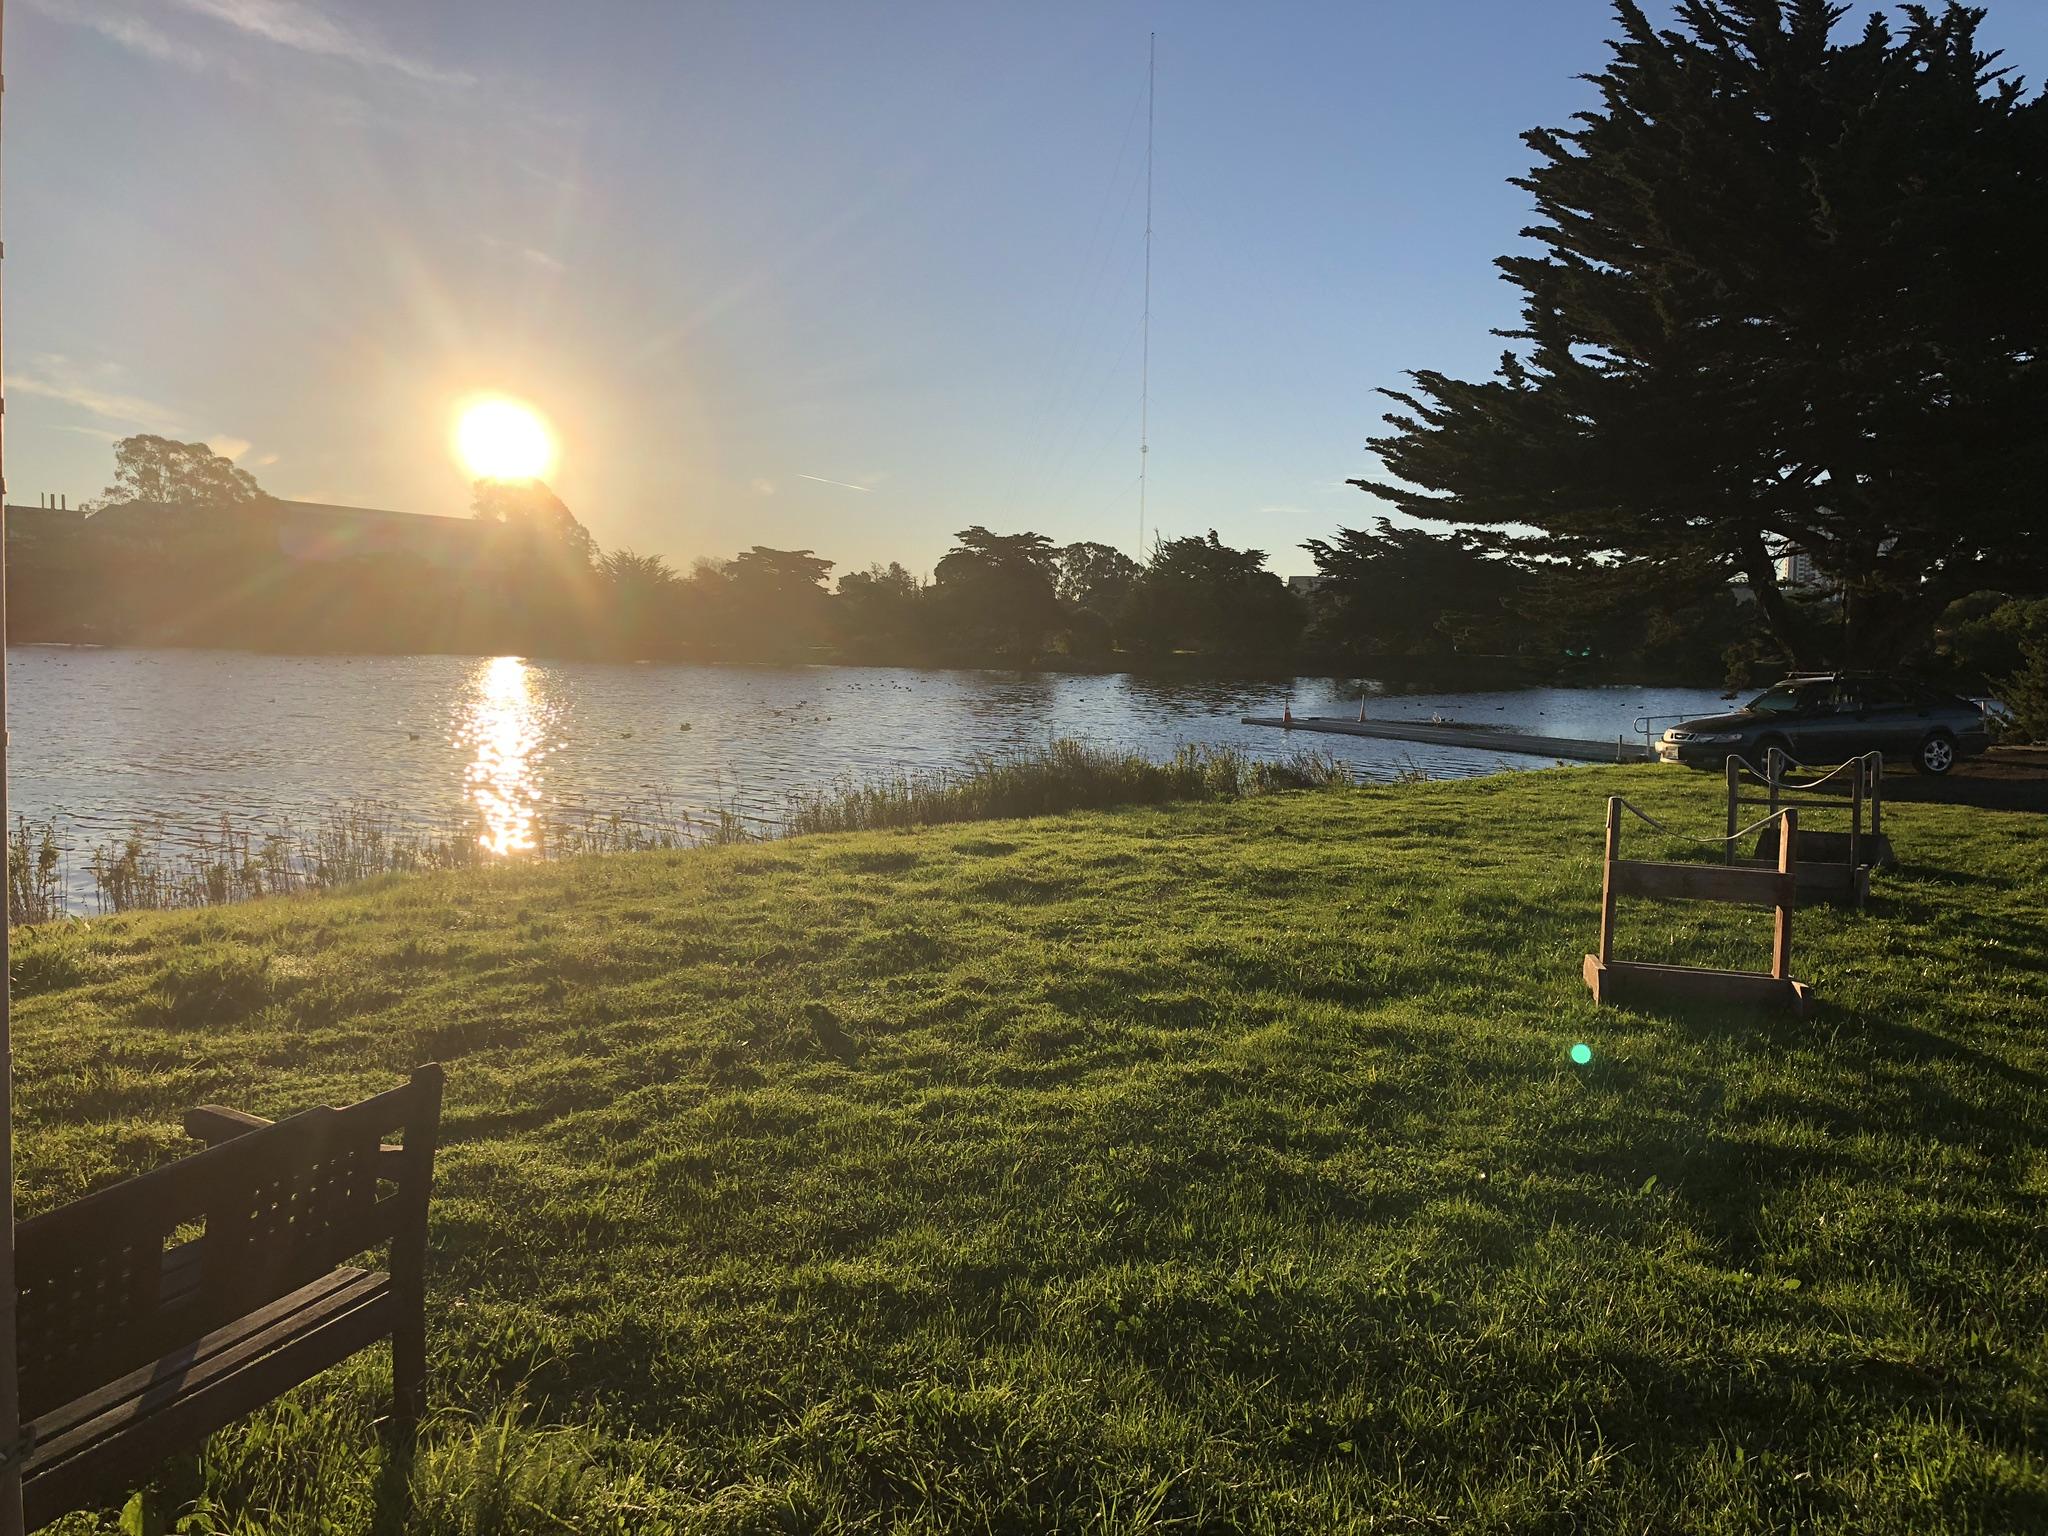 berkeley_rowing_lagoon_southend